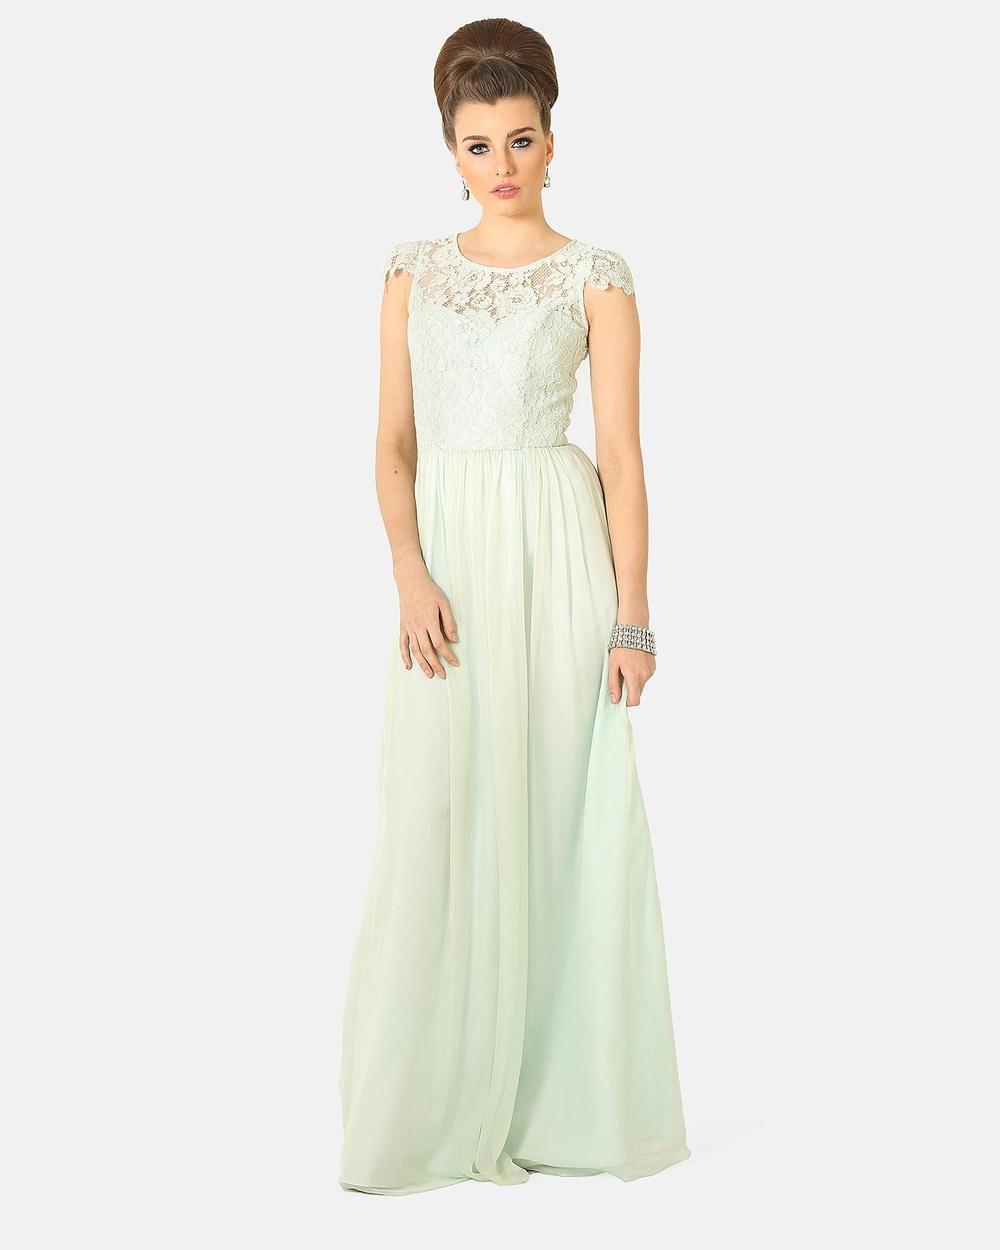 Tania Olsen Designs Latitia Dress Bridesmaid Dresses Mint Latitia Dress